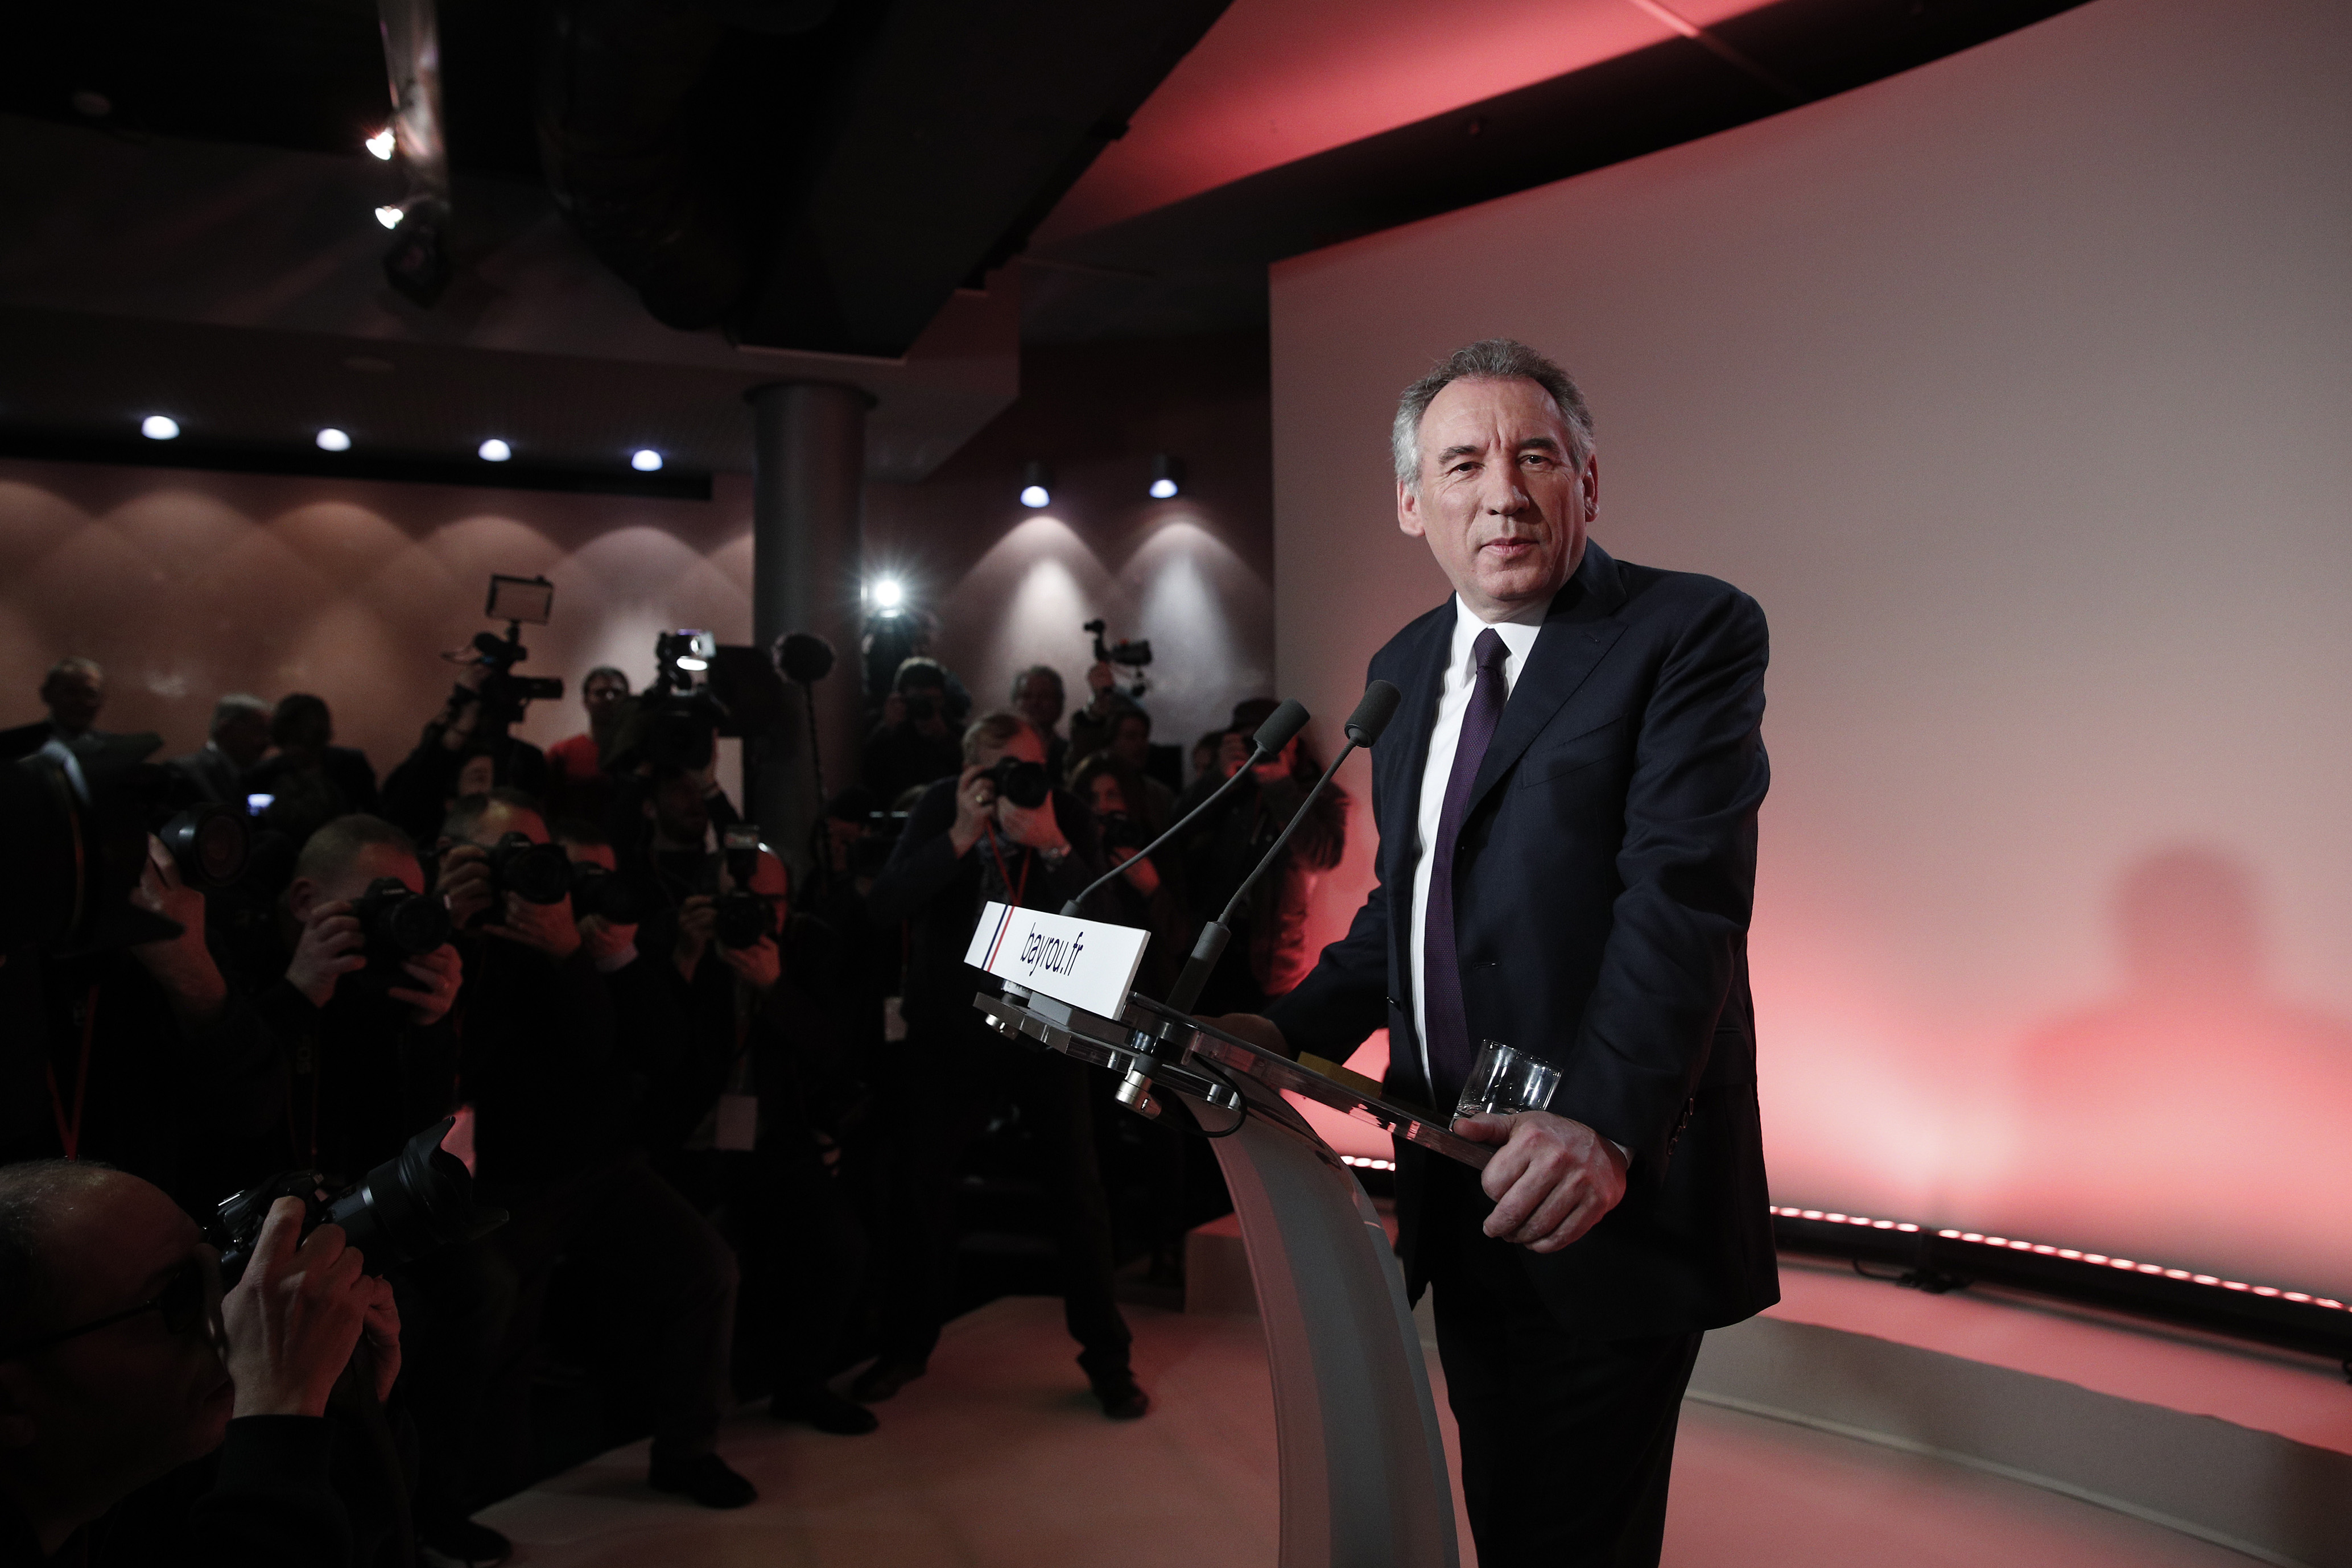 Французский политик-центрист Франсуа Байру отказался баллотироваться навыборах президента